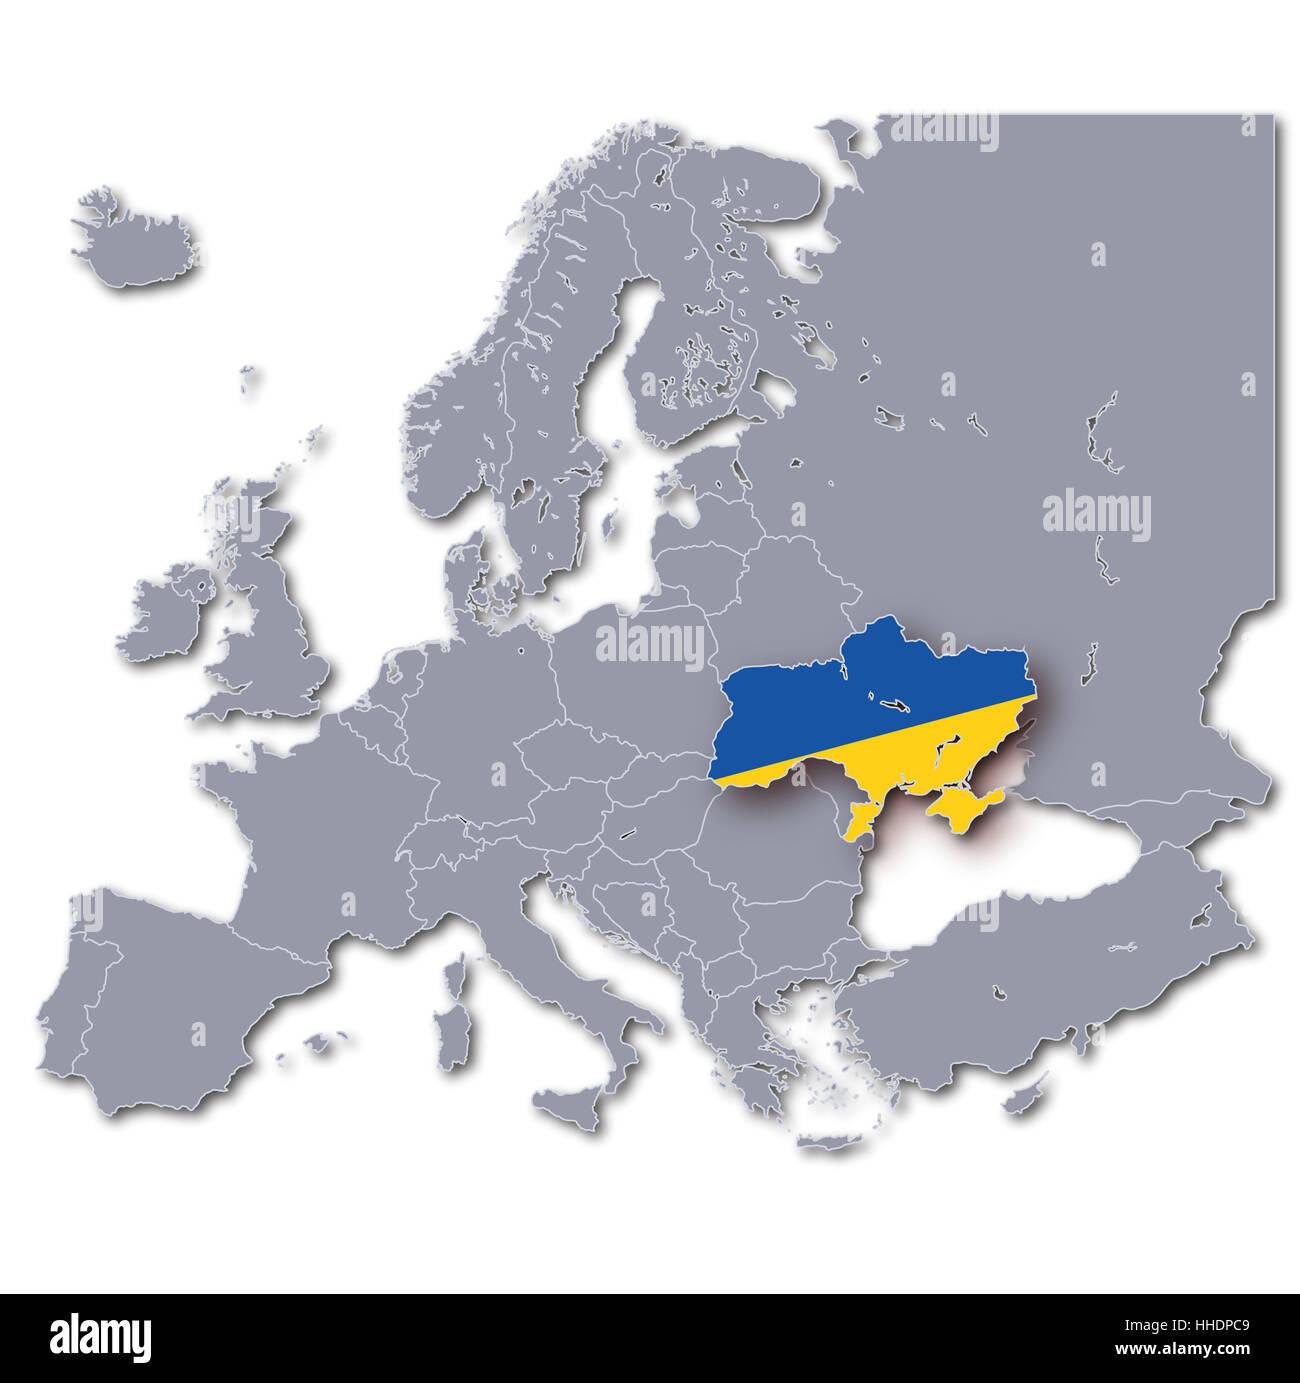 Ukraine On Map Of Europe.Map Of Europe Ukraine Stock Photo 131224697 Alamy